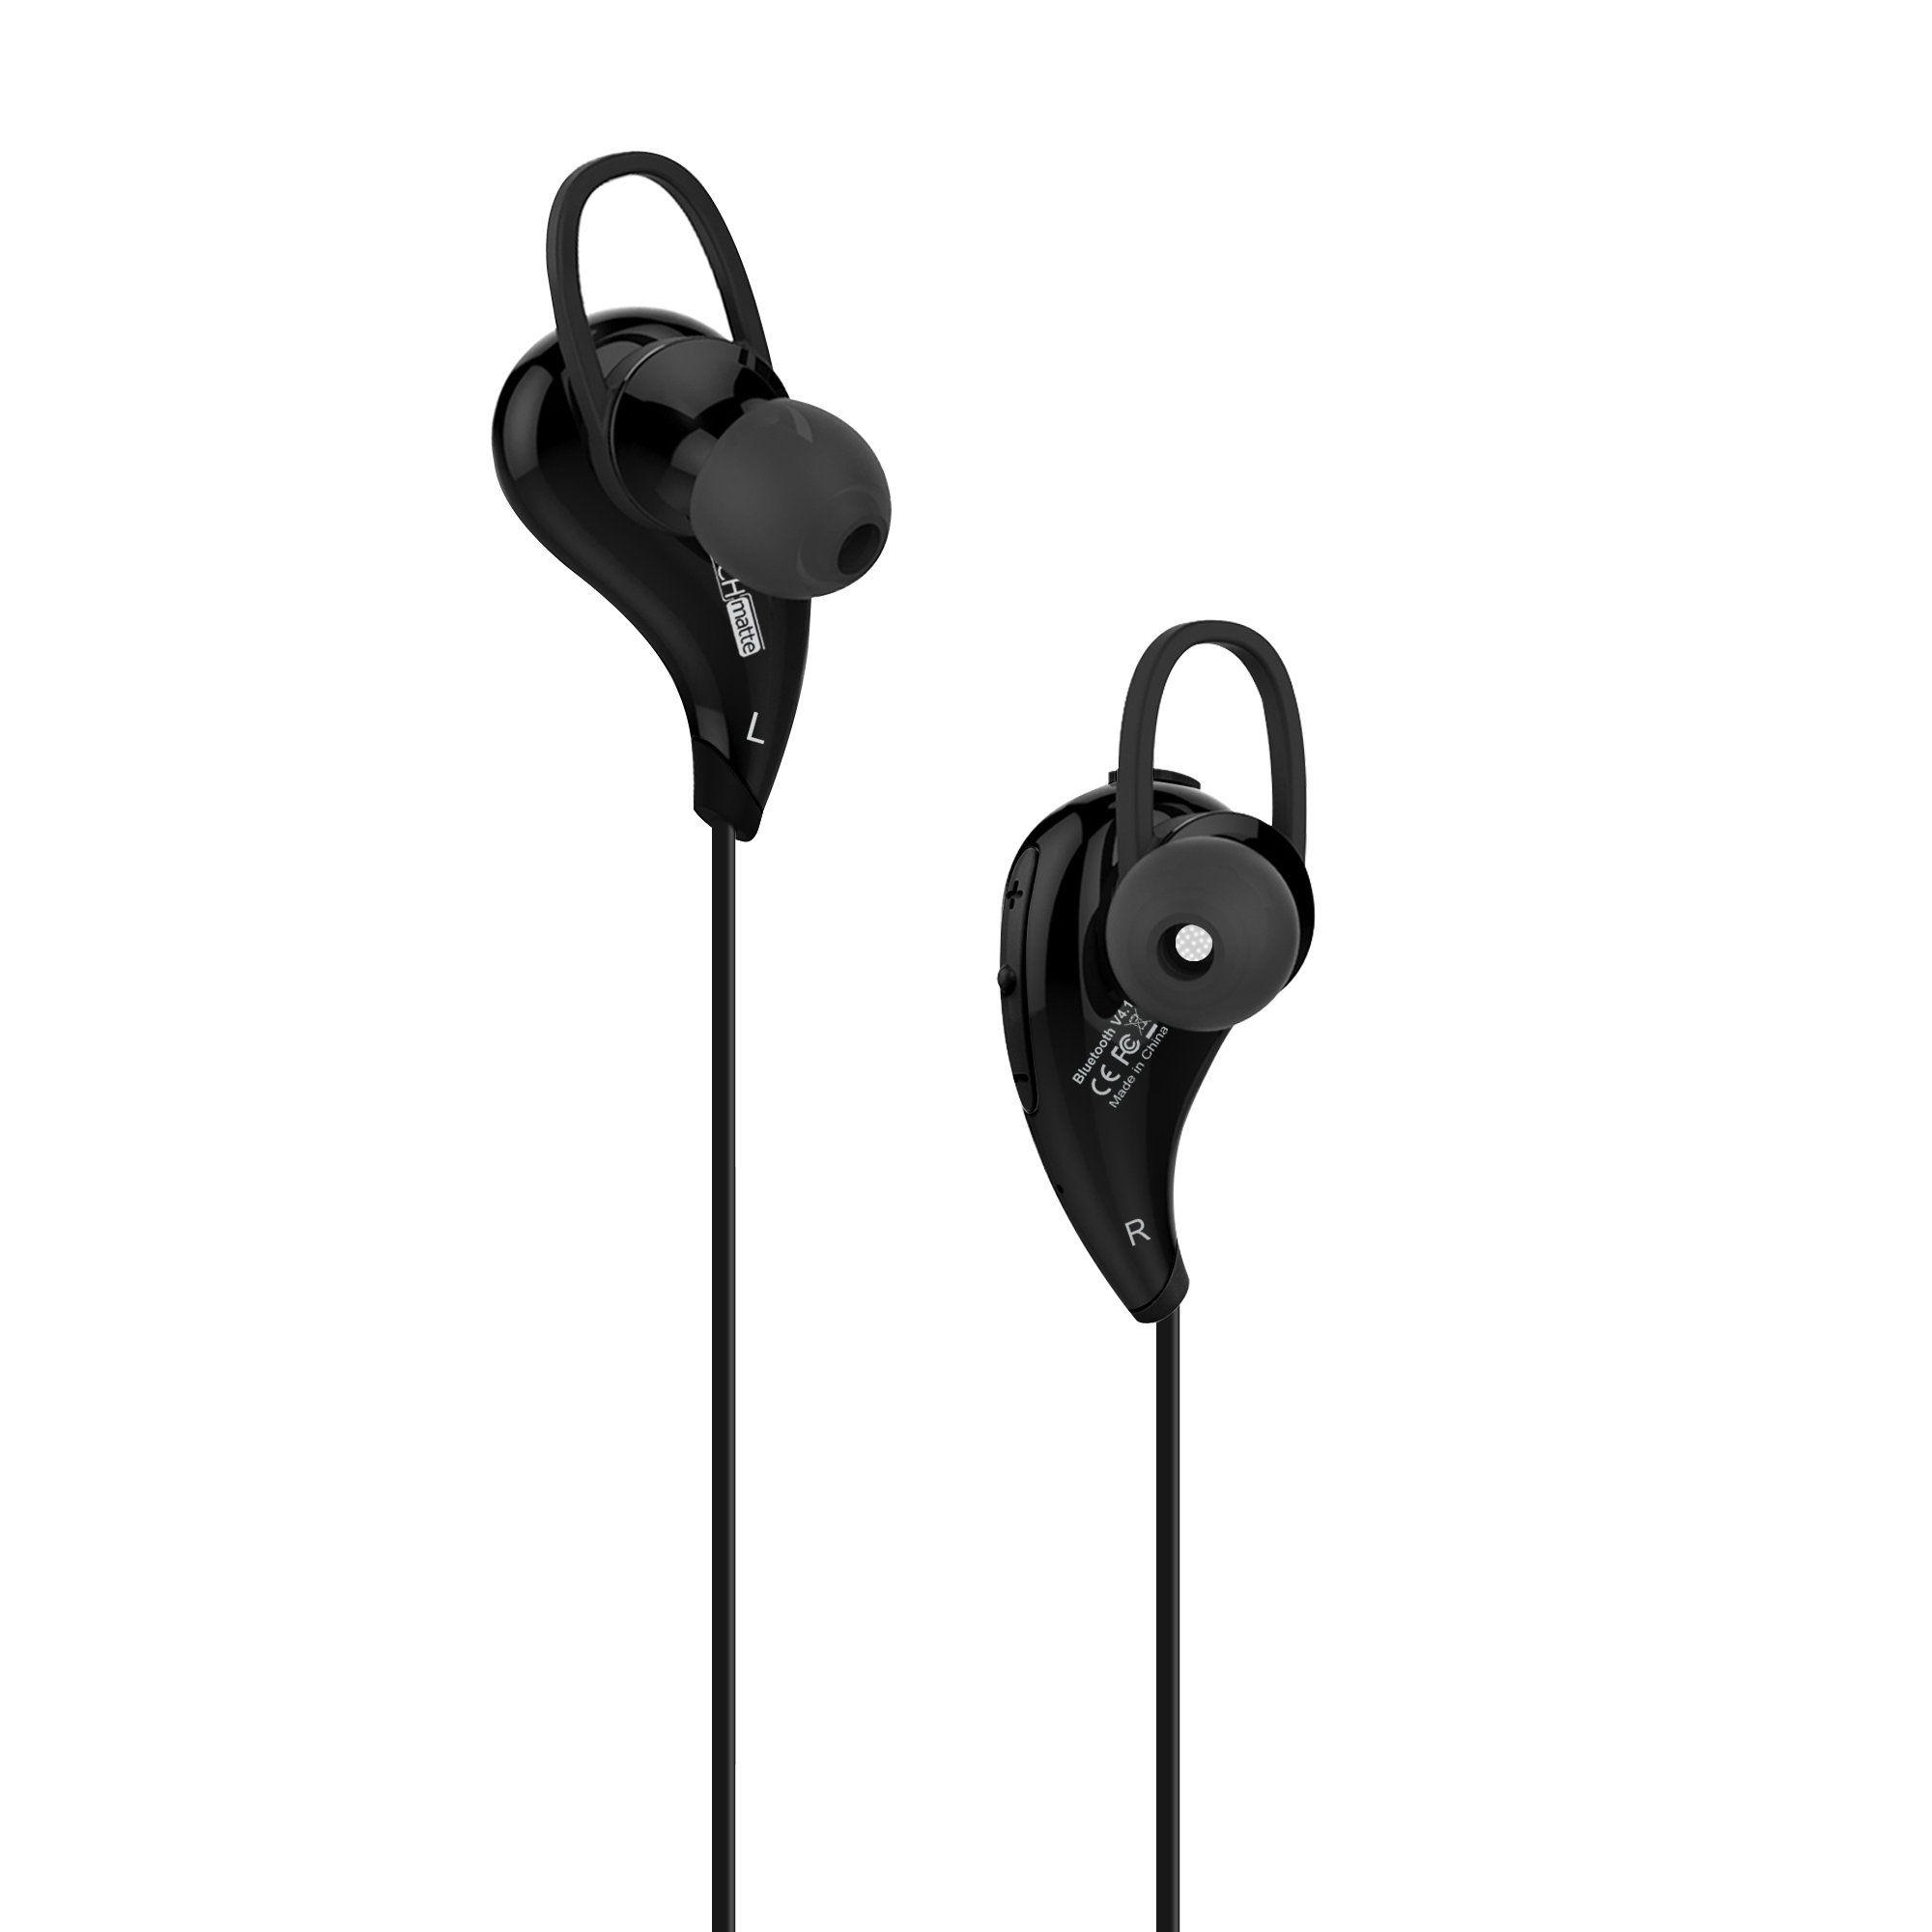 Iphone 8 Bluetooth Headphones Techmatte Bluetooth Earbud Headphones For Apple Iphone X 8 8 Plus 7 6s Earbud Headphones Phone Accessories Samsung Headphones